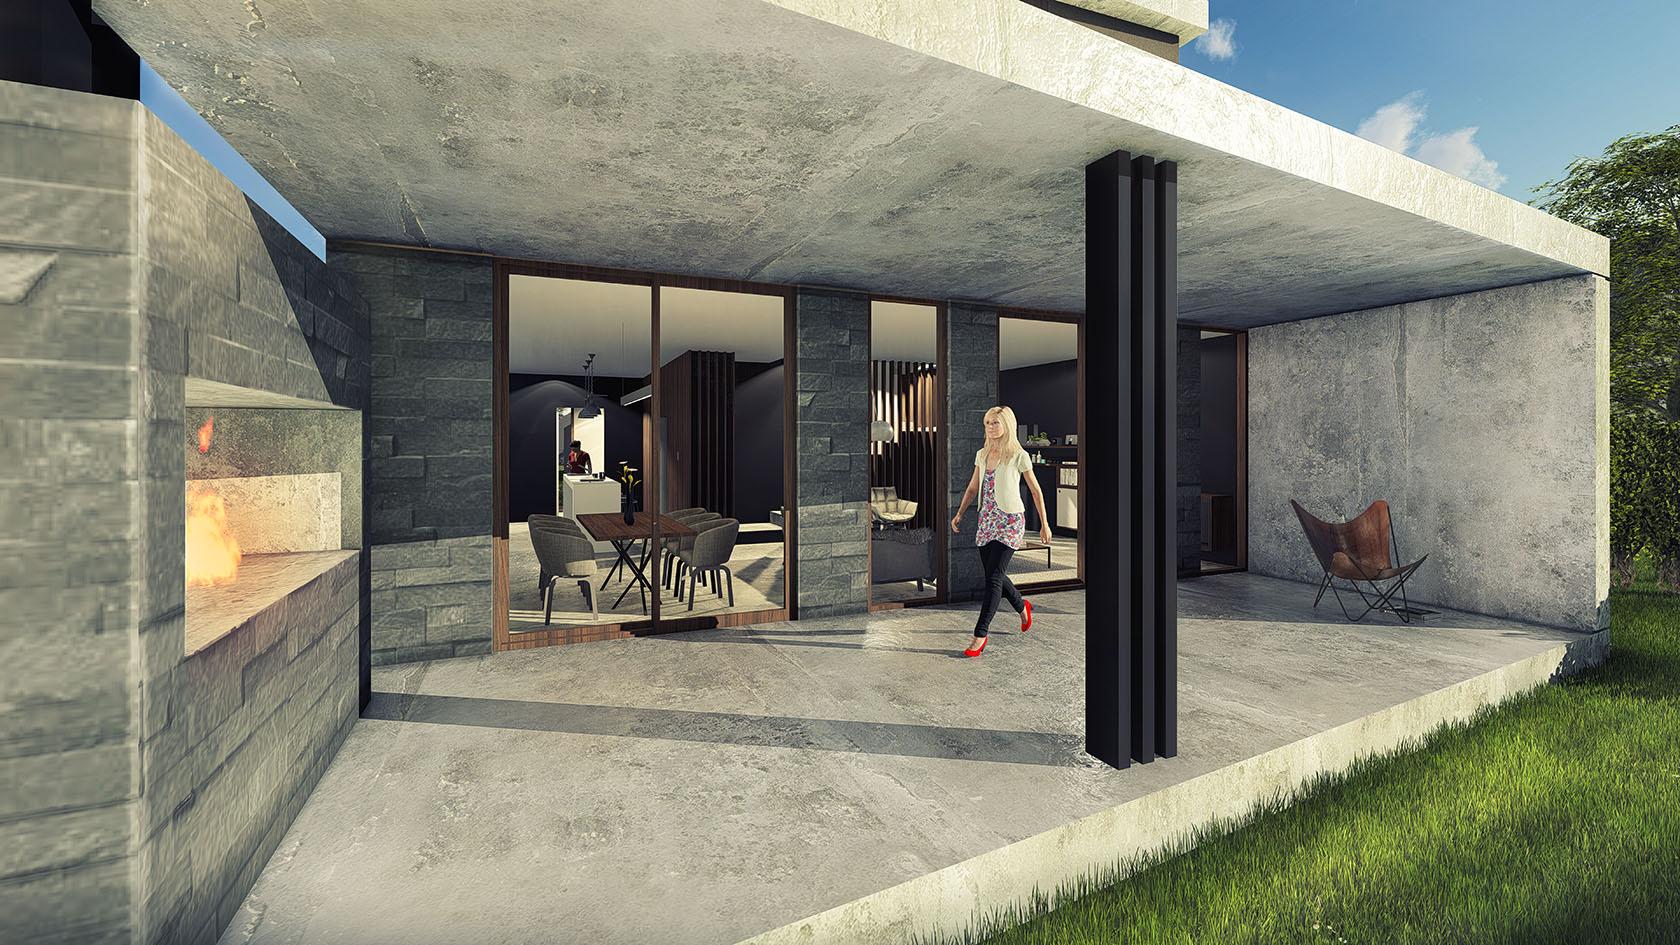 Vista galería, casas con columnas negras, fachadas modernas con materiales rústicos